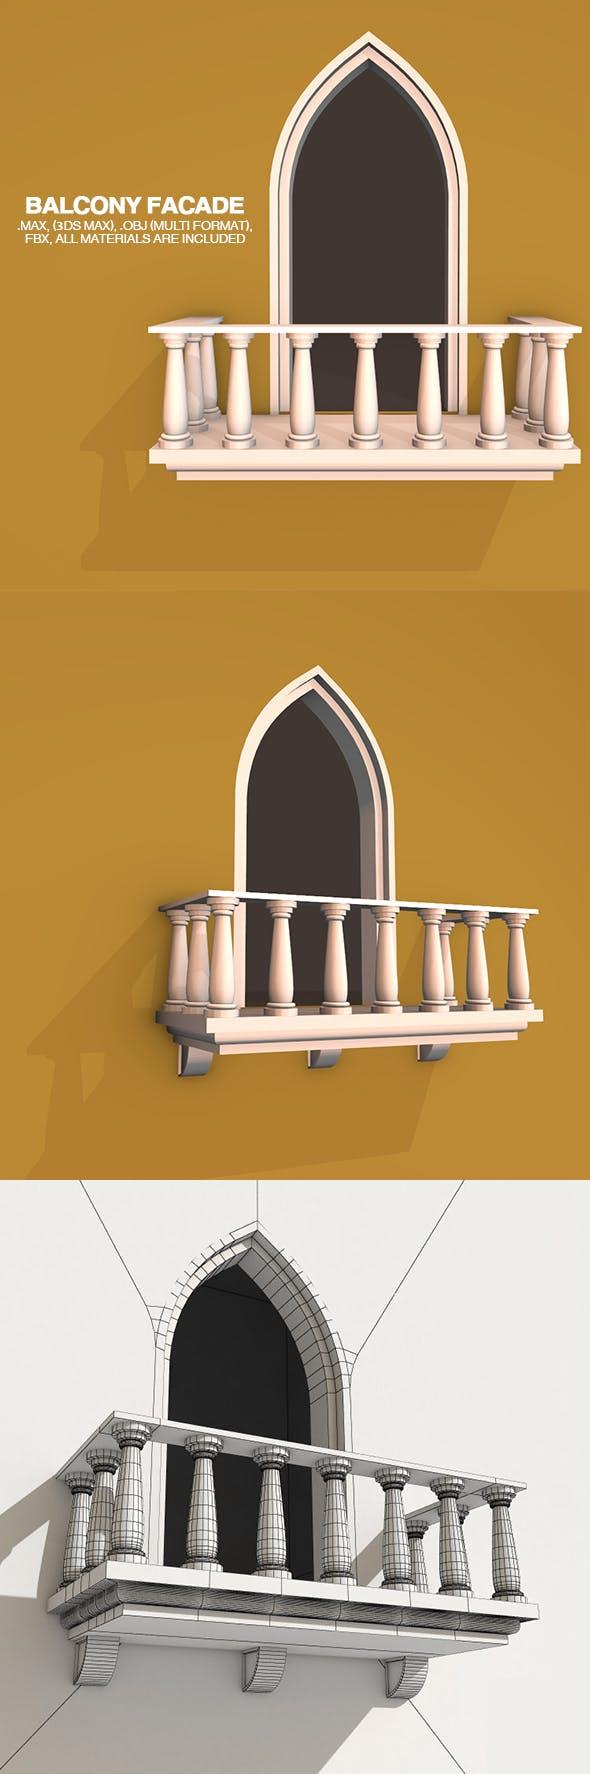 Balcony Facade - 3DOcean Item for Sale